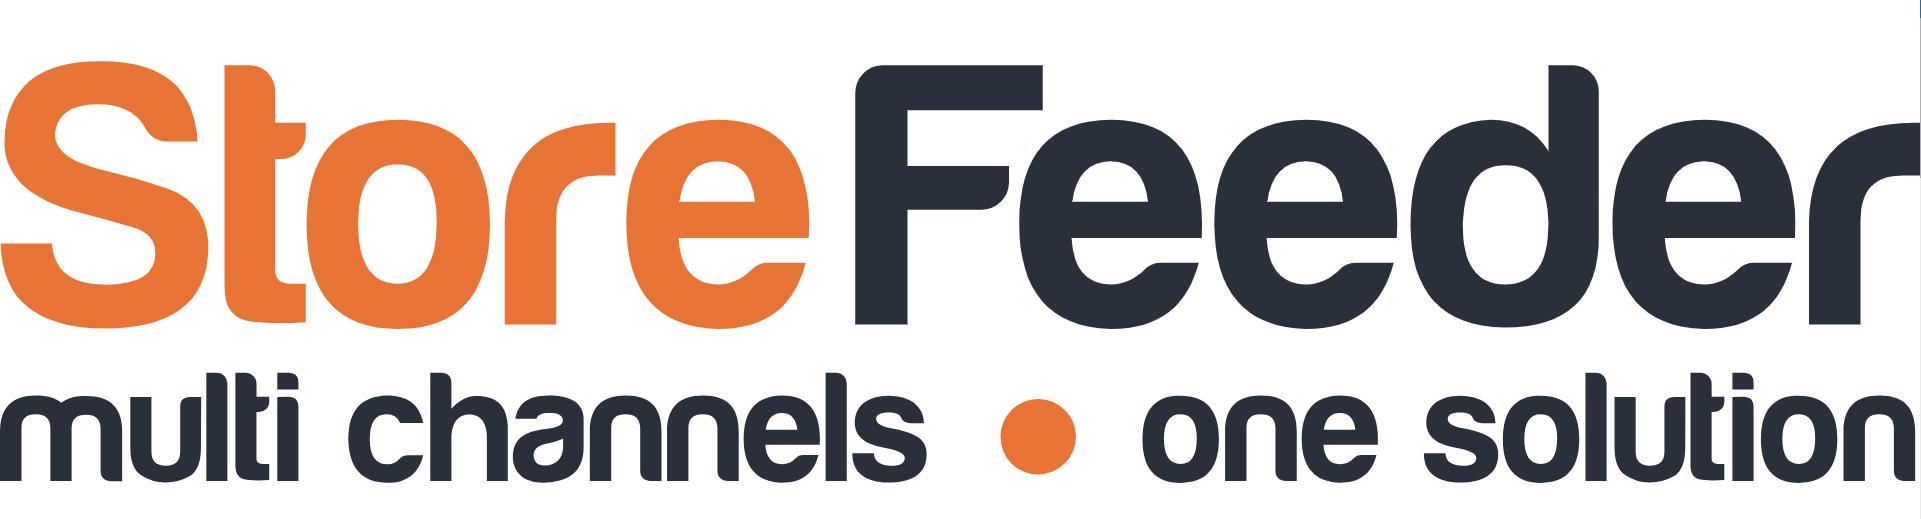 Storefeeder-logo